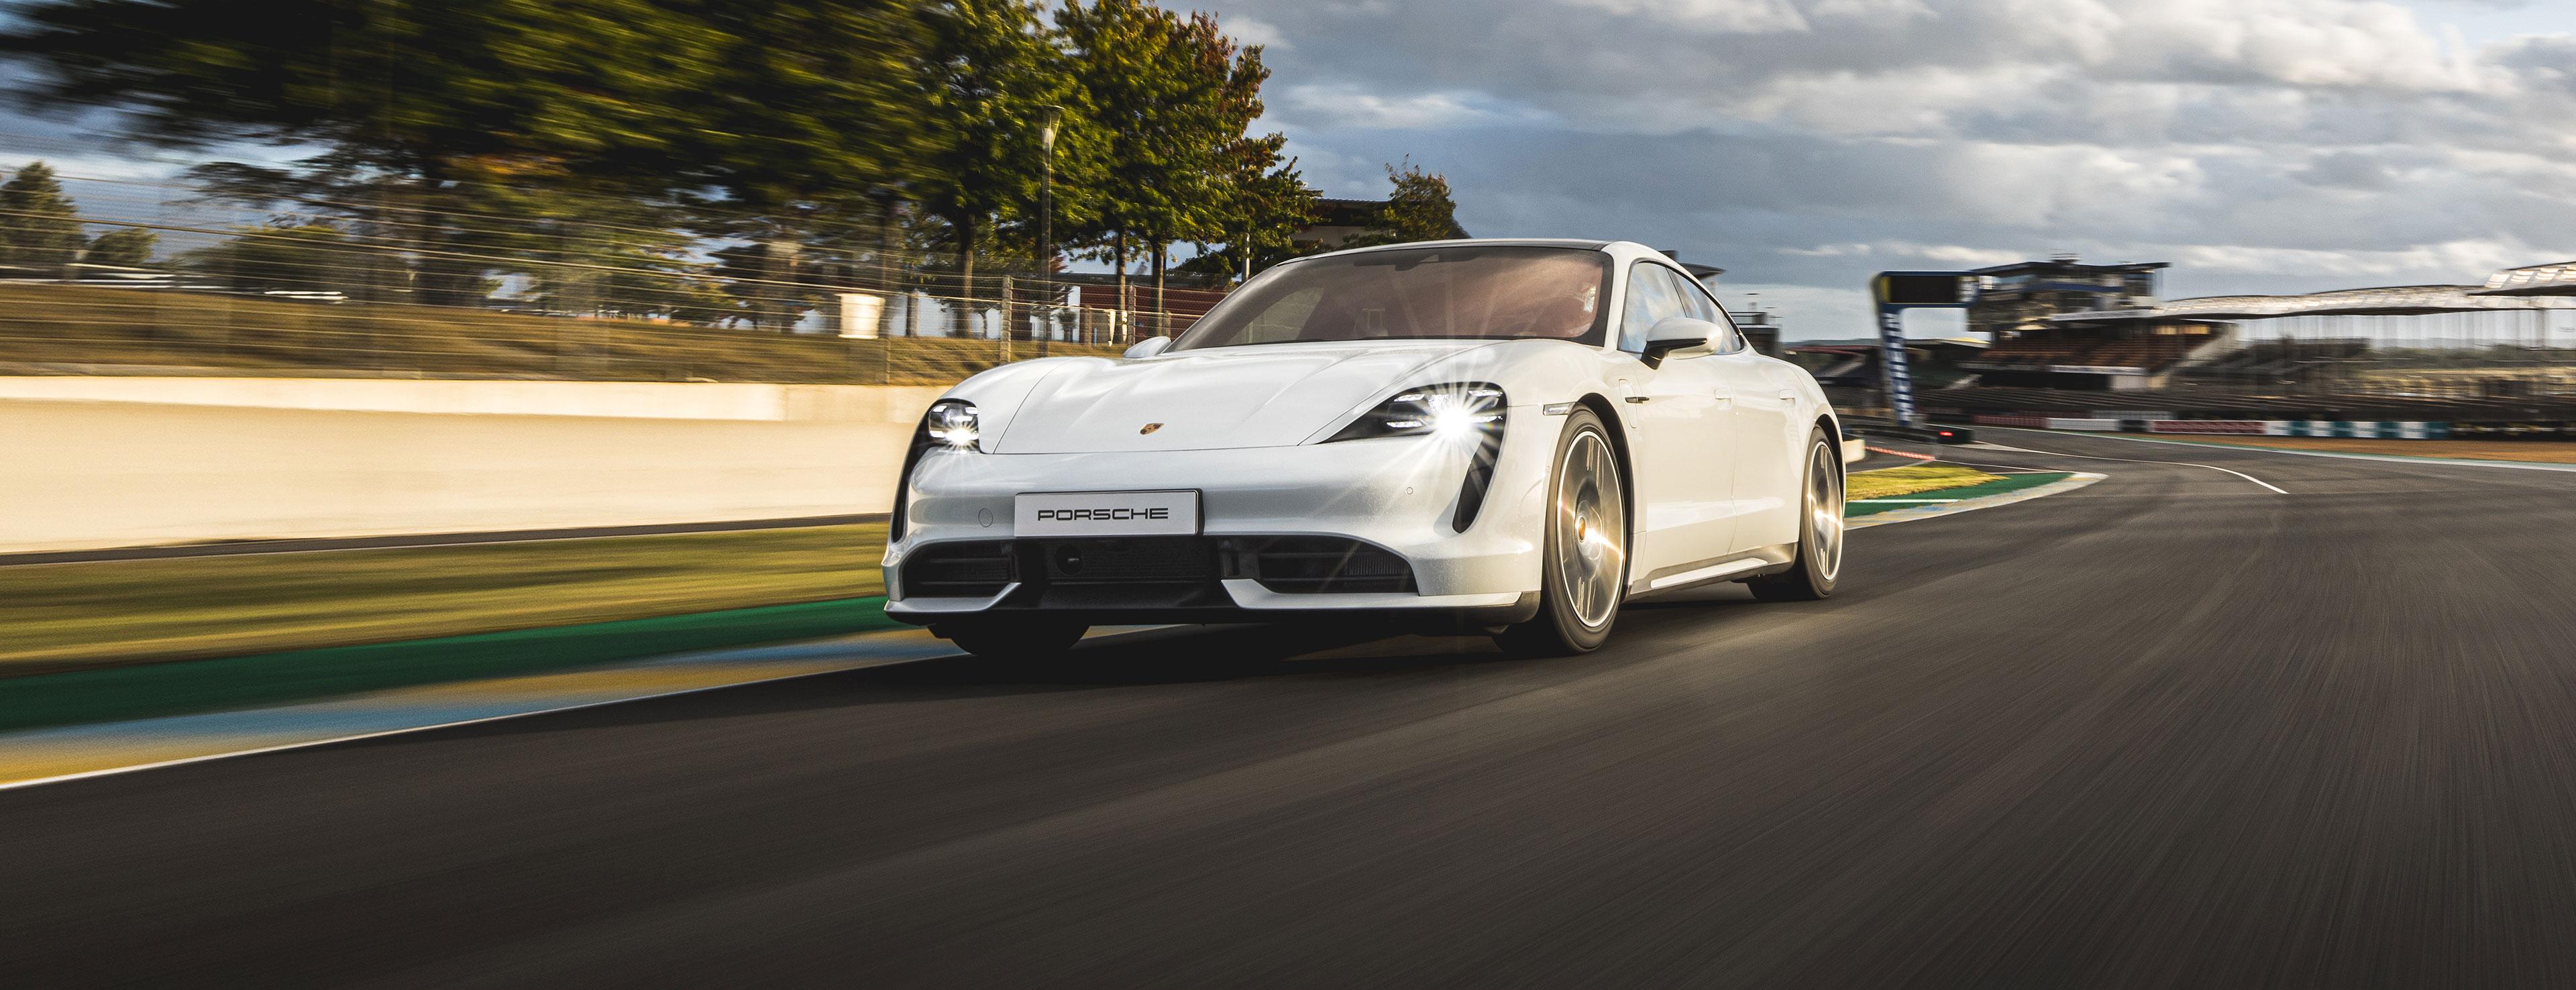 Dr. Ing. h.c. F. Porsche AG Porsche France